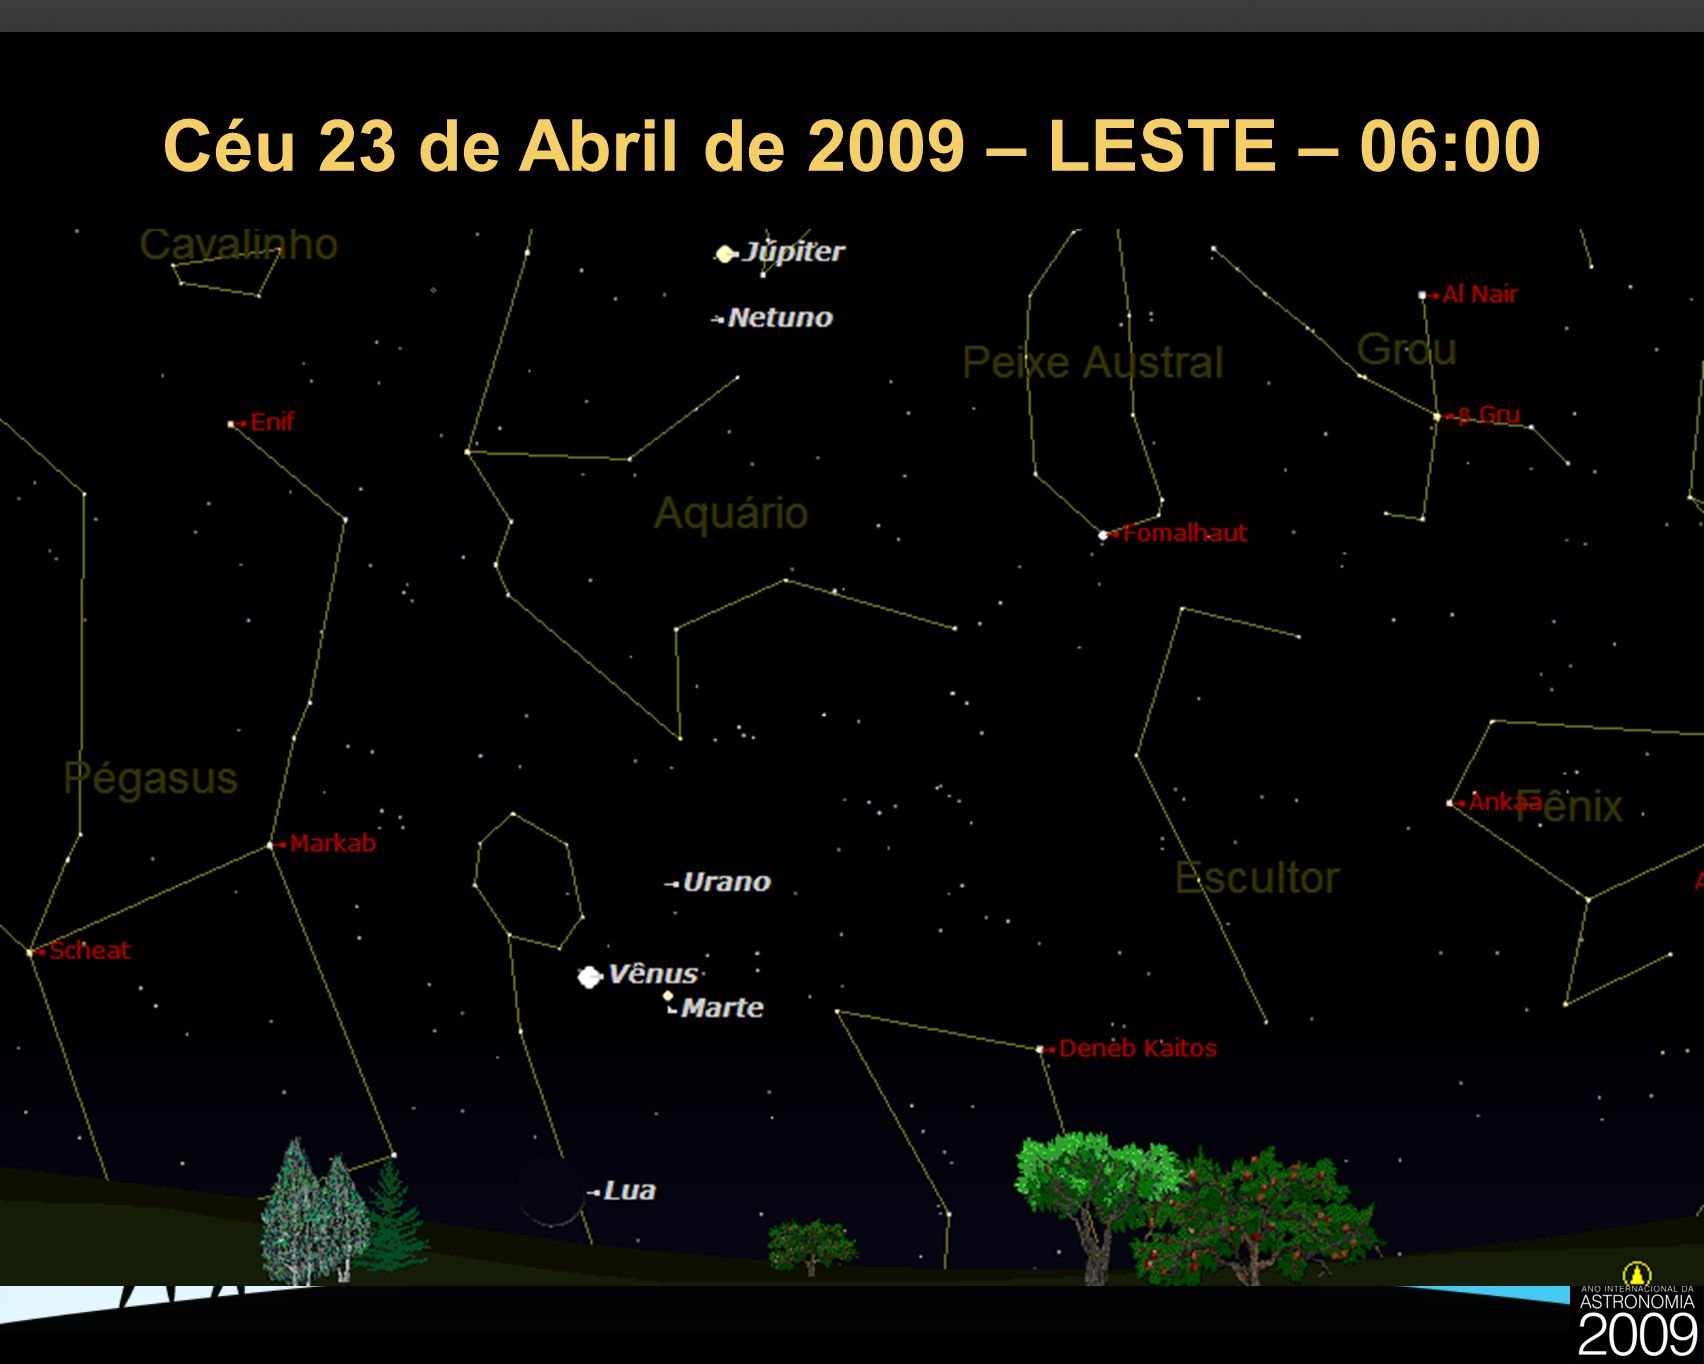 Céu 23 de Abril de 2009 – LESTE – 06:00